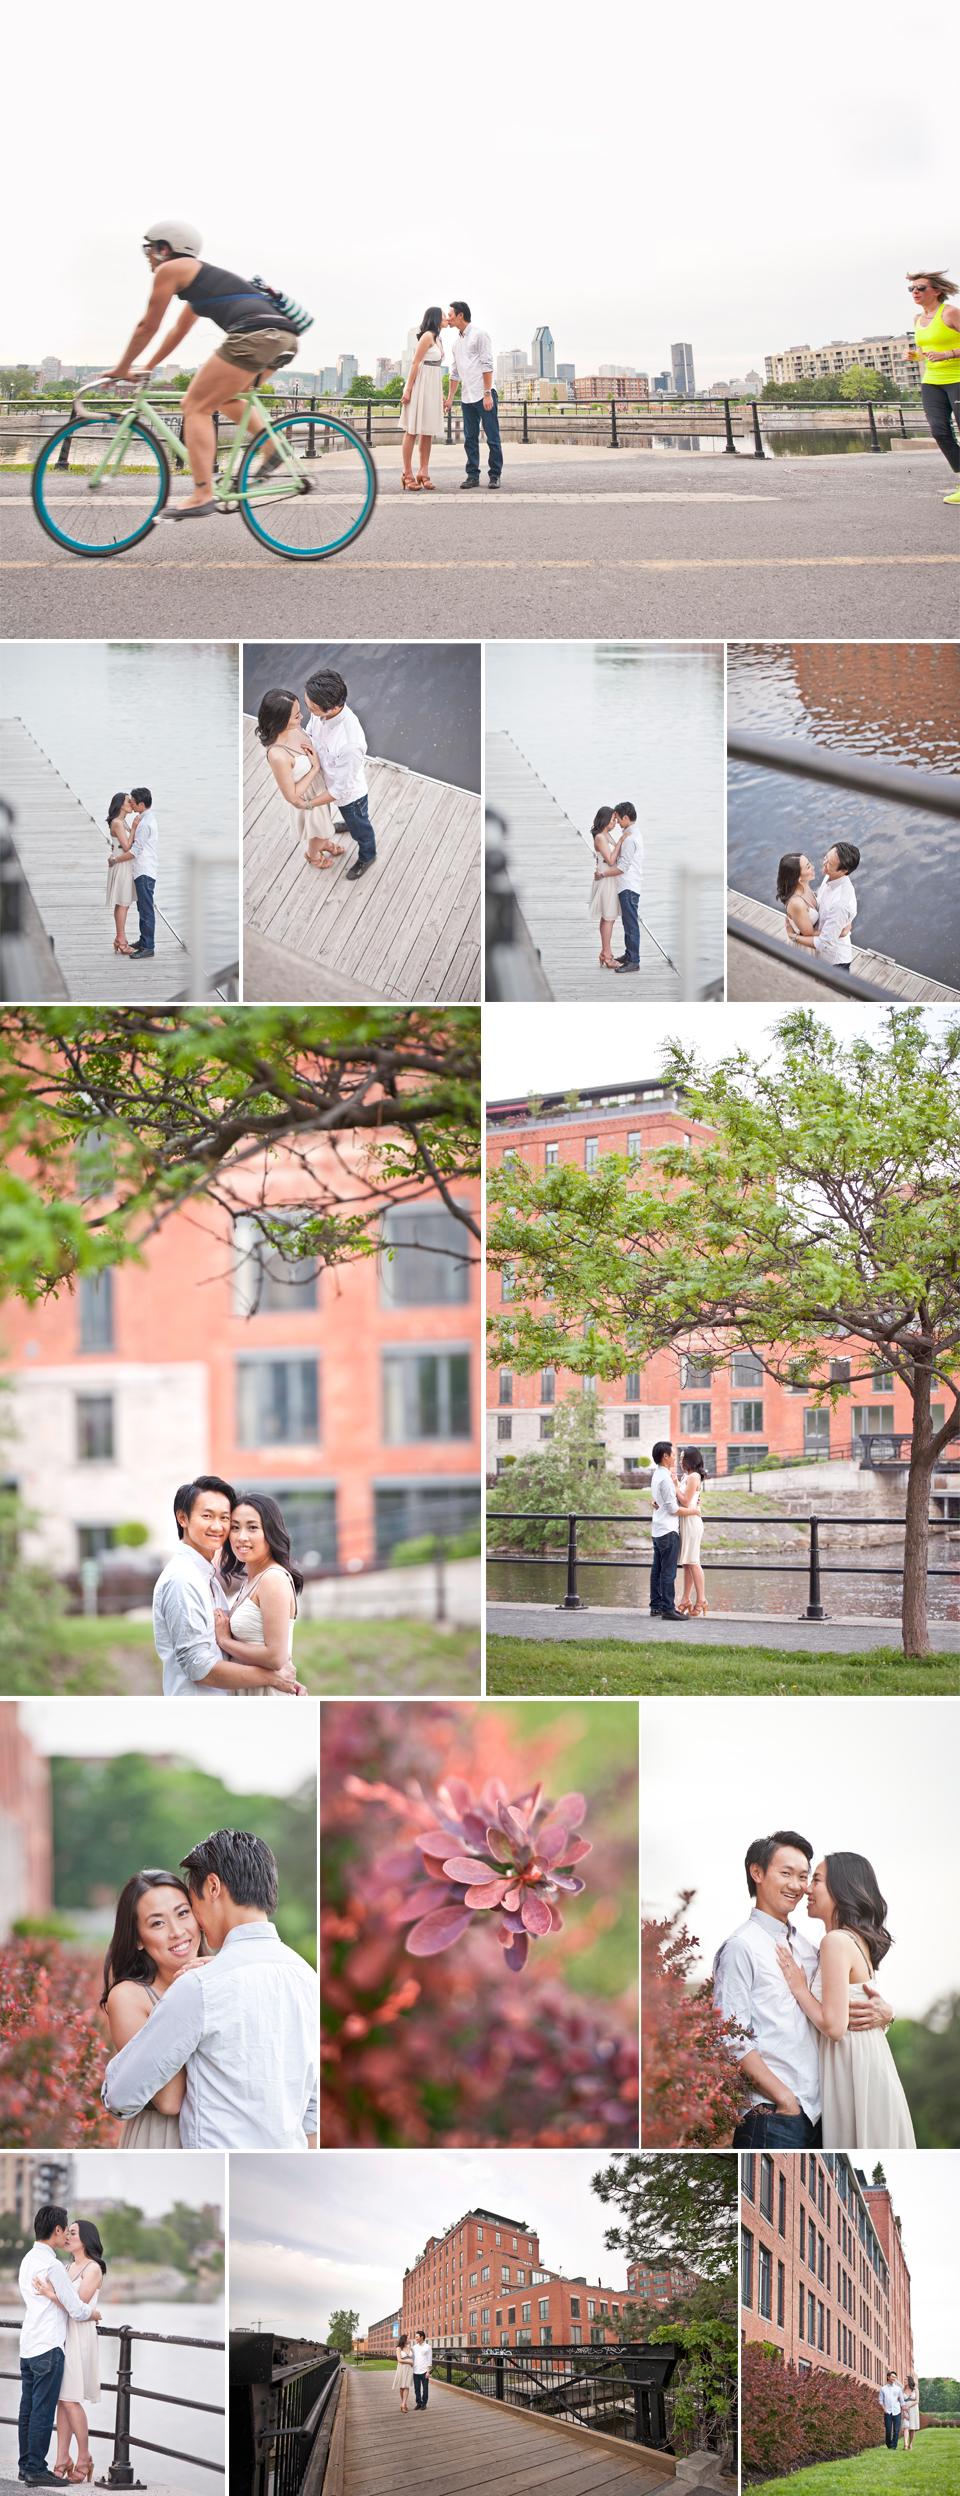 Montreal Wedding Photographer   Lachine Canal   Bike   Montreal Quebec   LMP Wedding Photography and Videography   Bike Paths